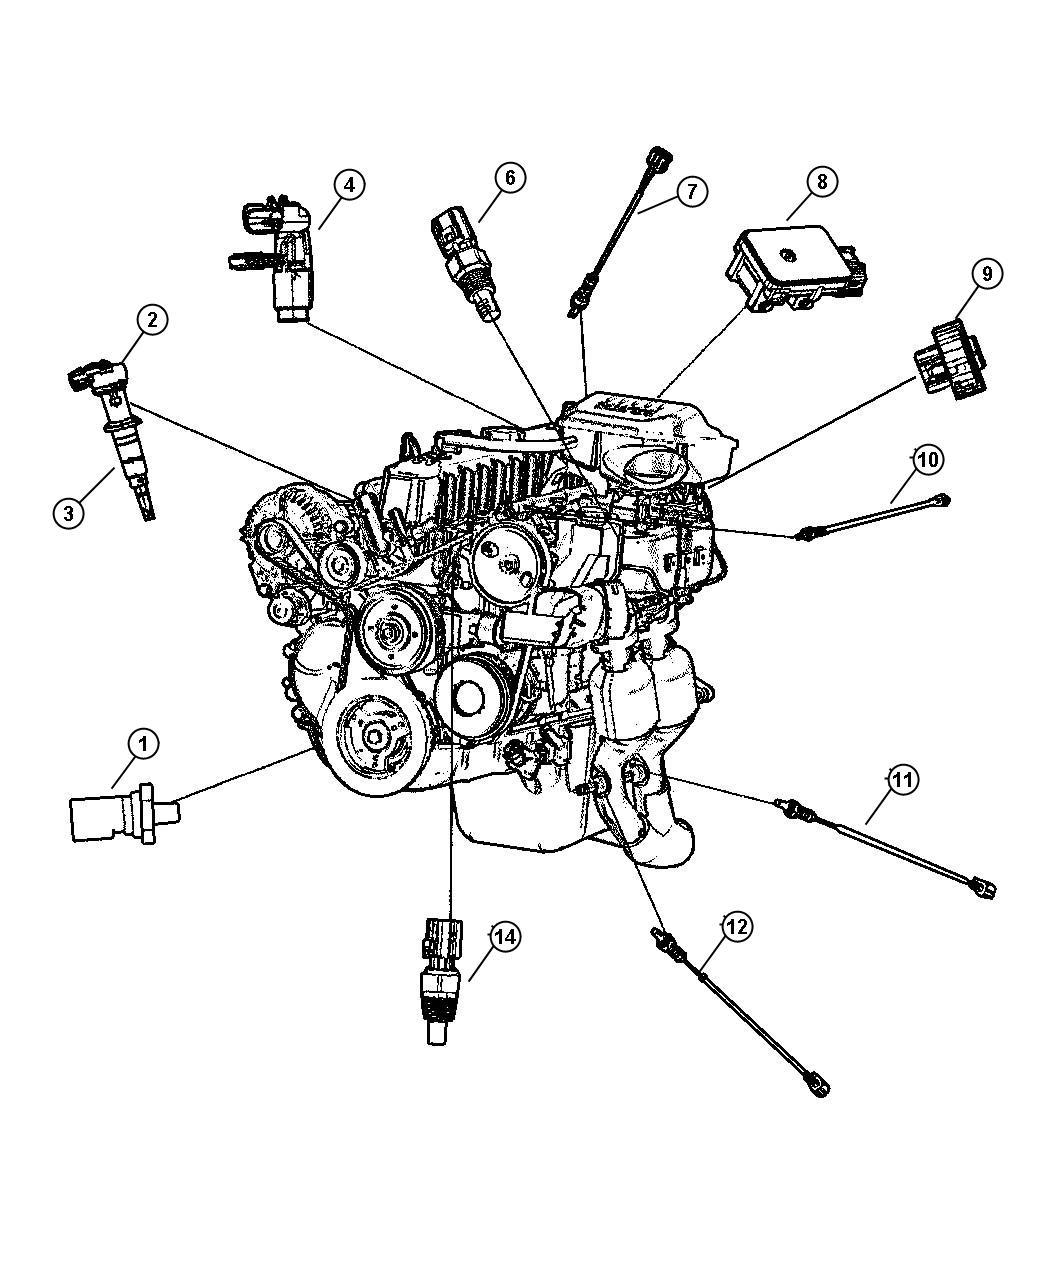 Jeep Cherokee 4 0 Engine Emissions Diagram